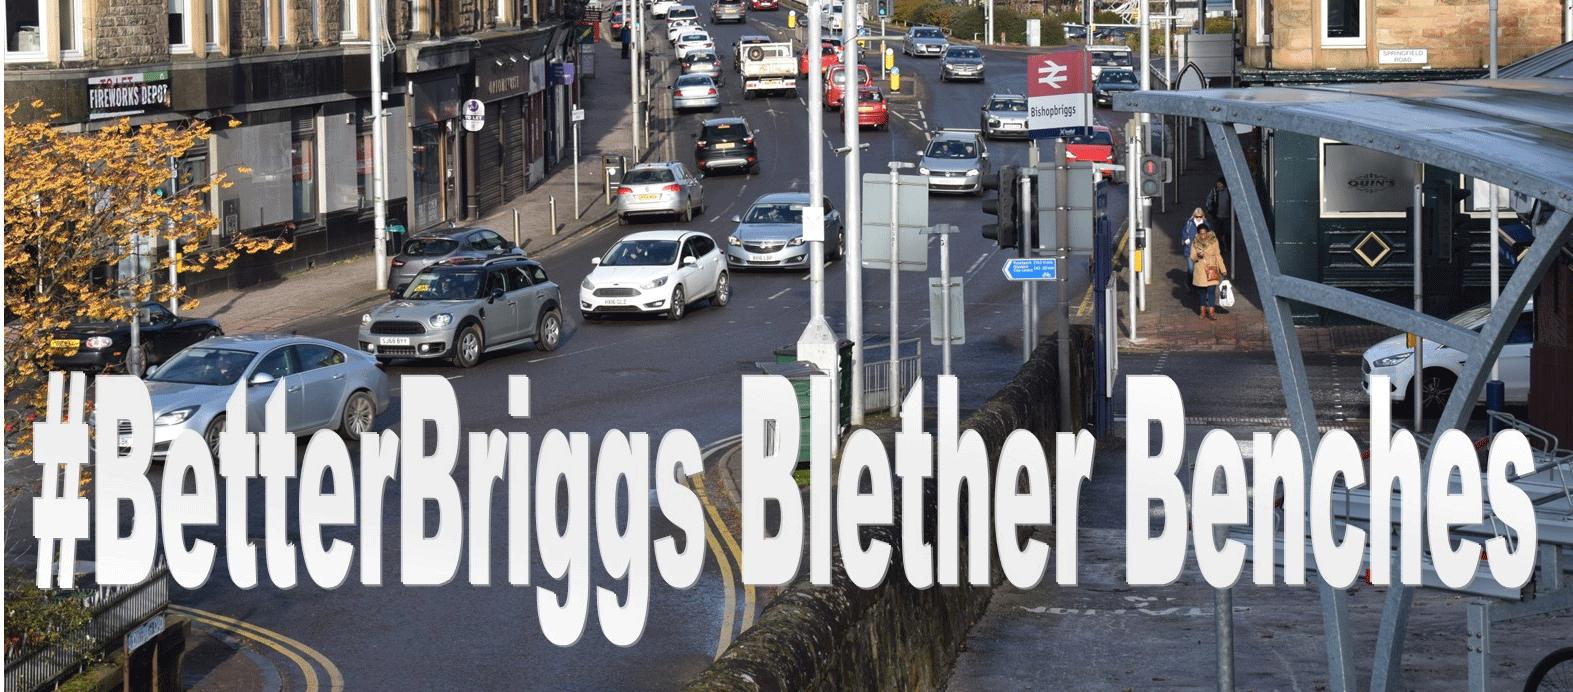 BetterBriggs